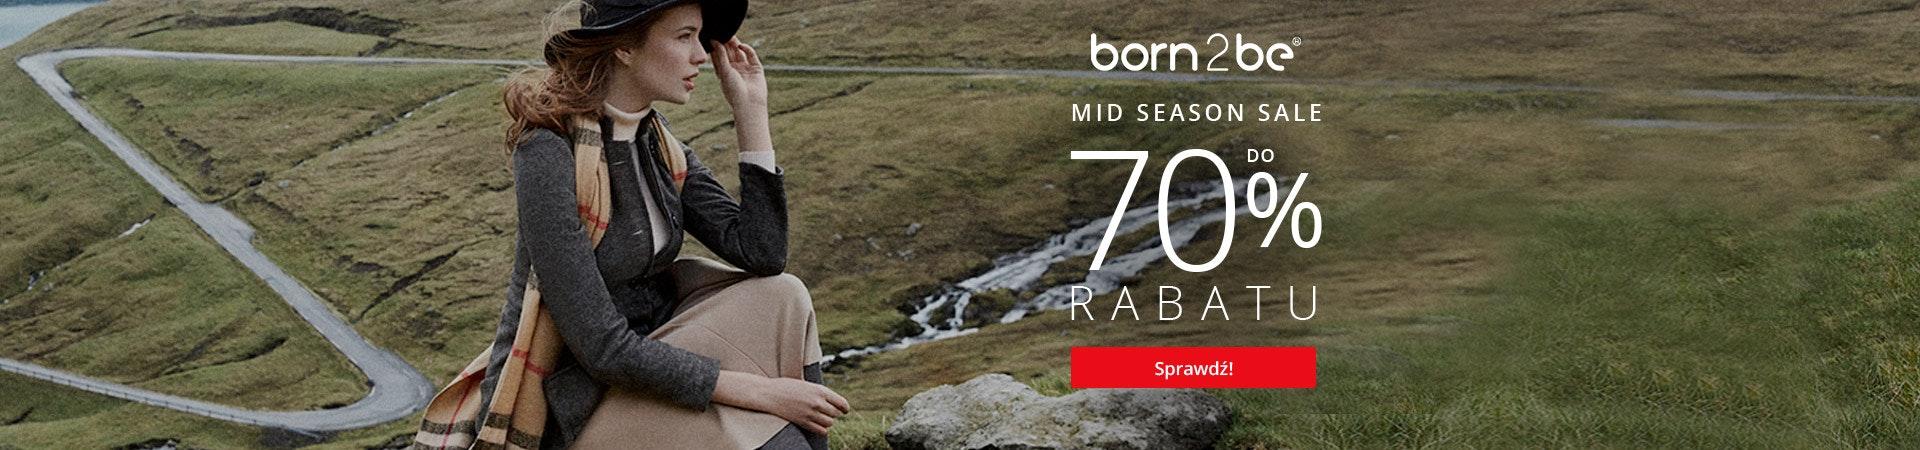 Born2be - Mid Season Sale -70%